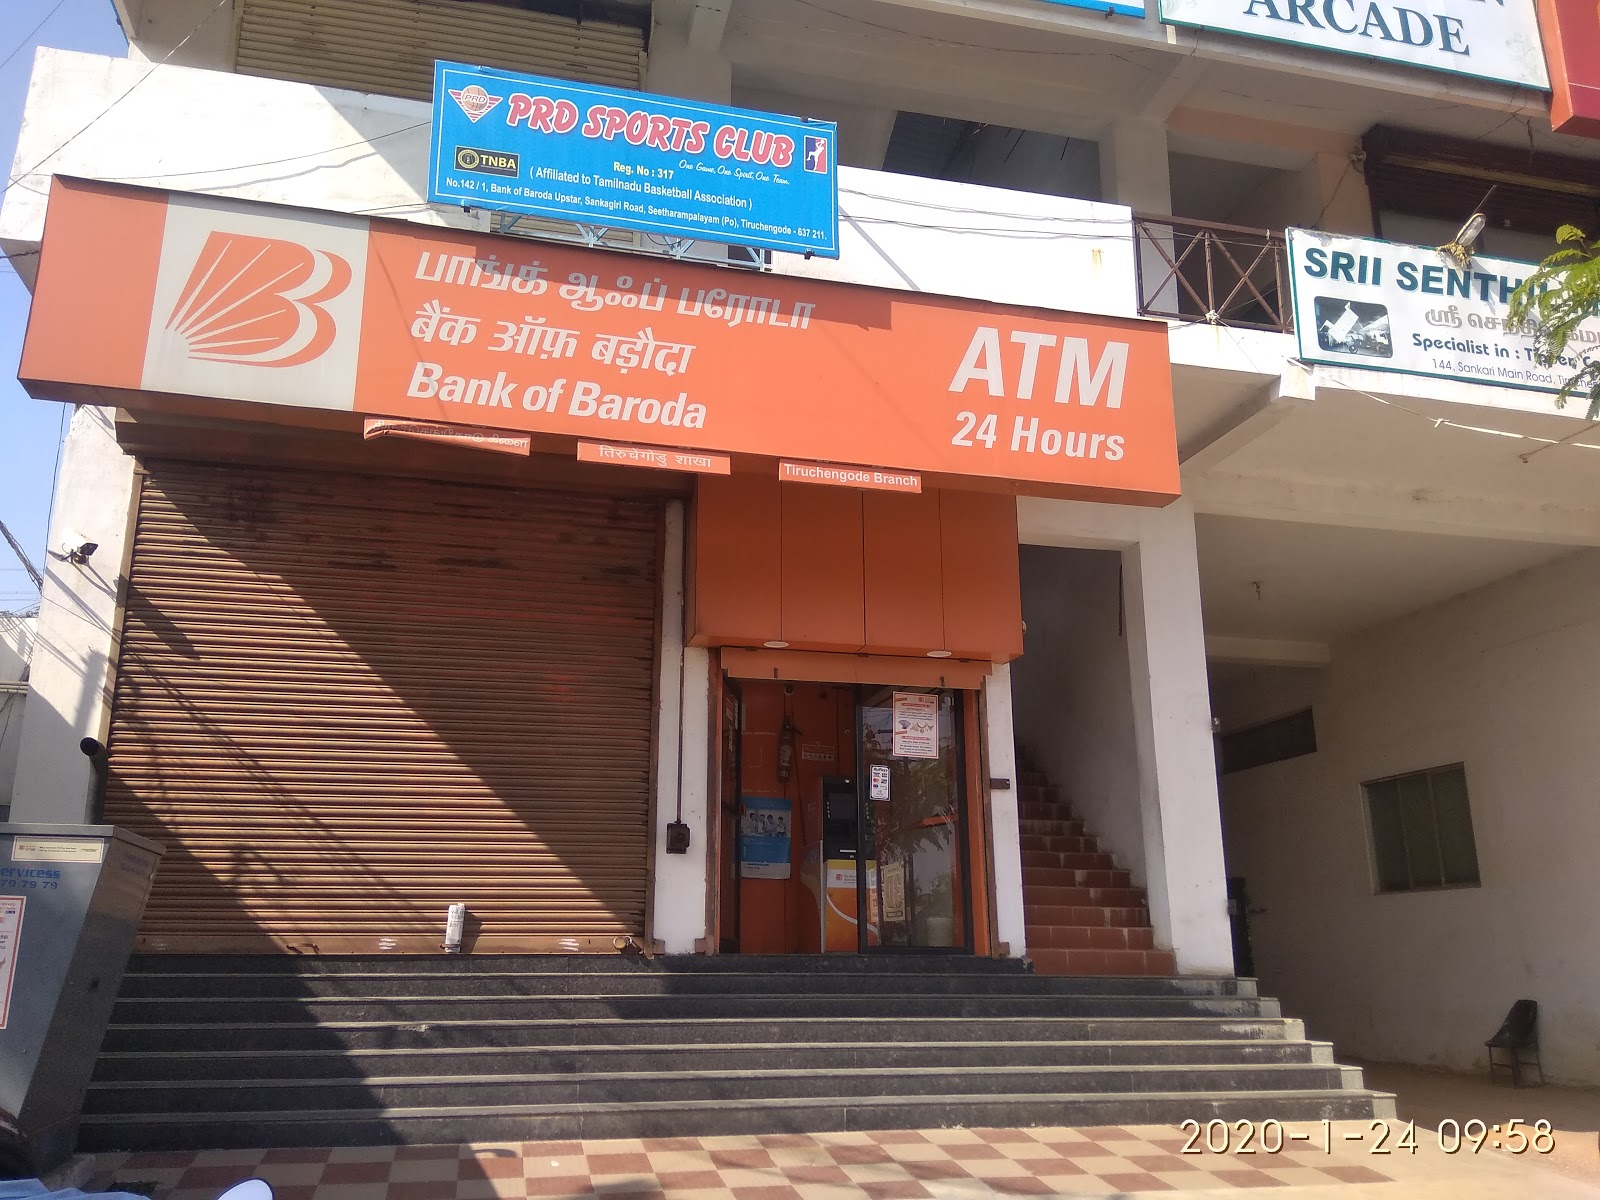 blood bank Bank Of Baroda near Tiruchengode Tamil Nadu